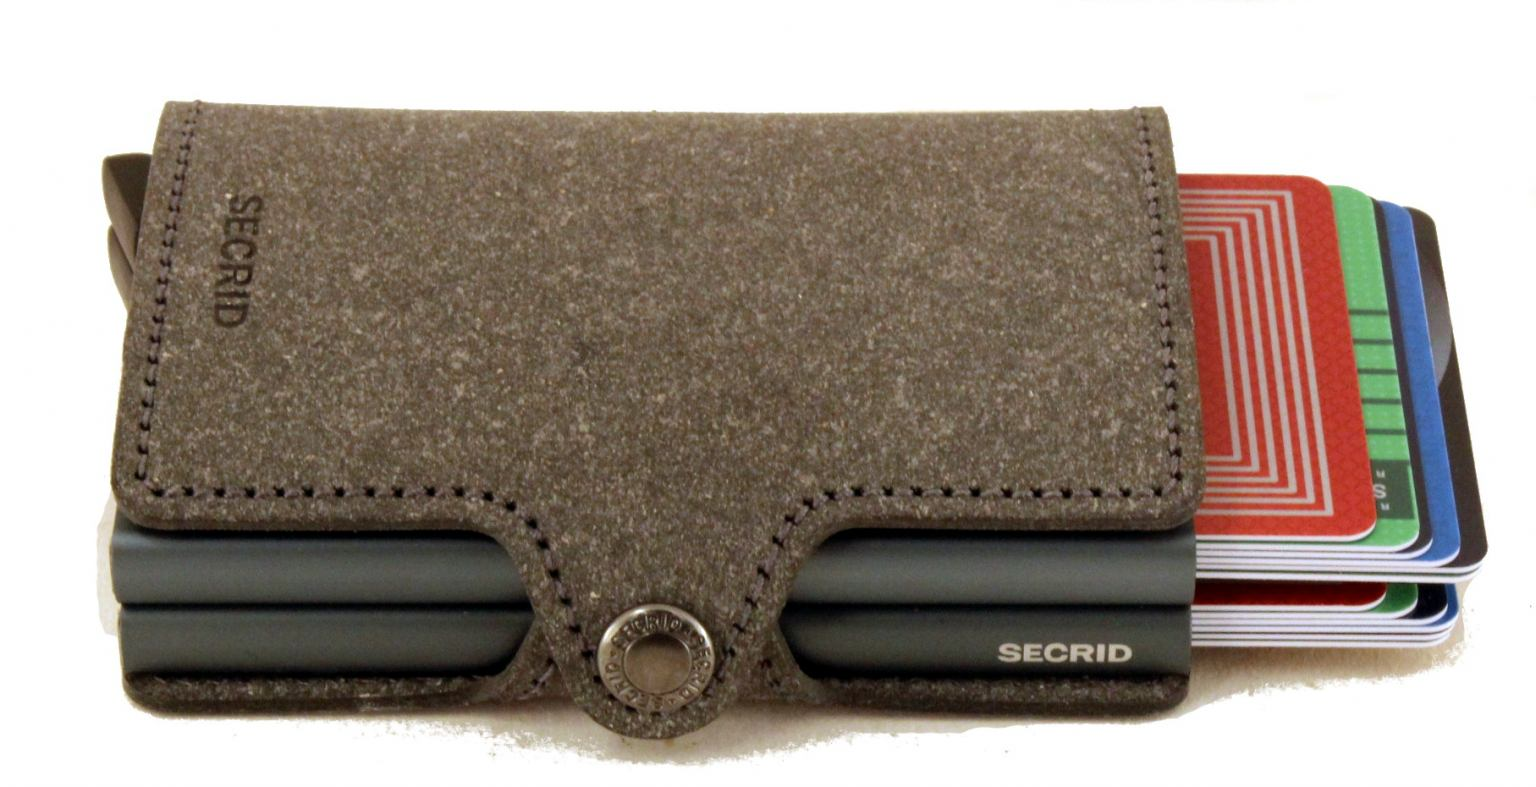 Secrid Cardrotector RFID-Schutz Twinwallet Original Black